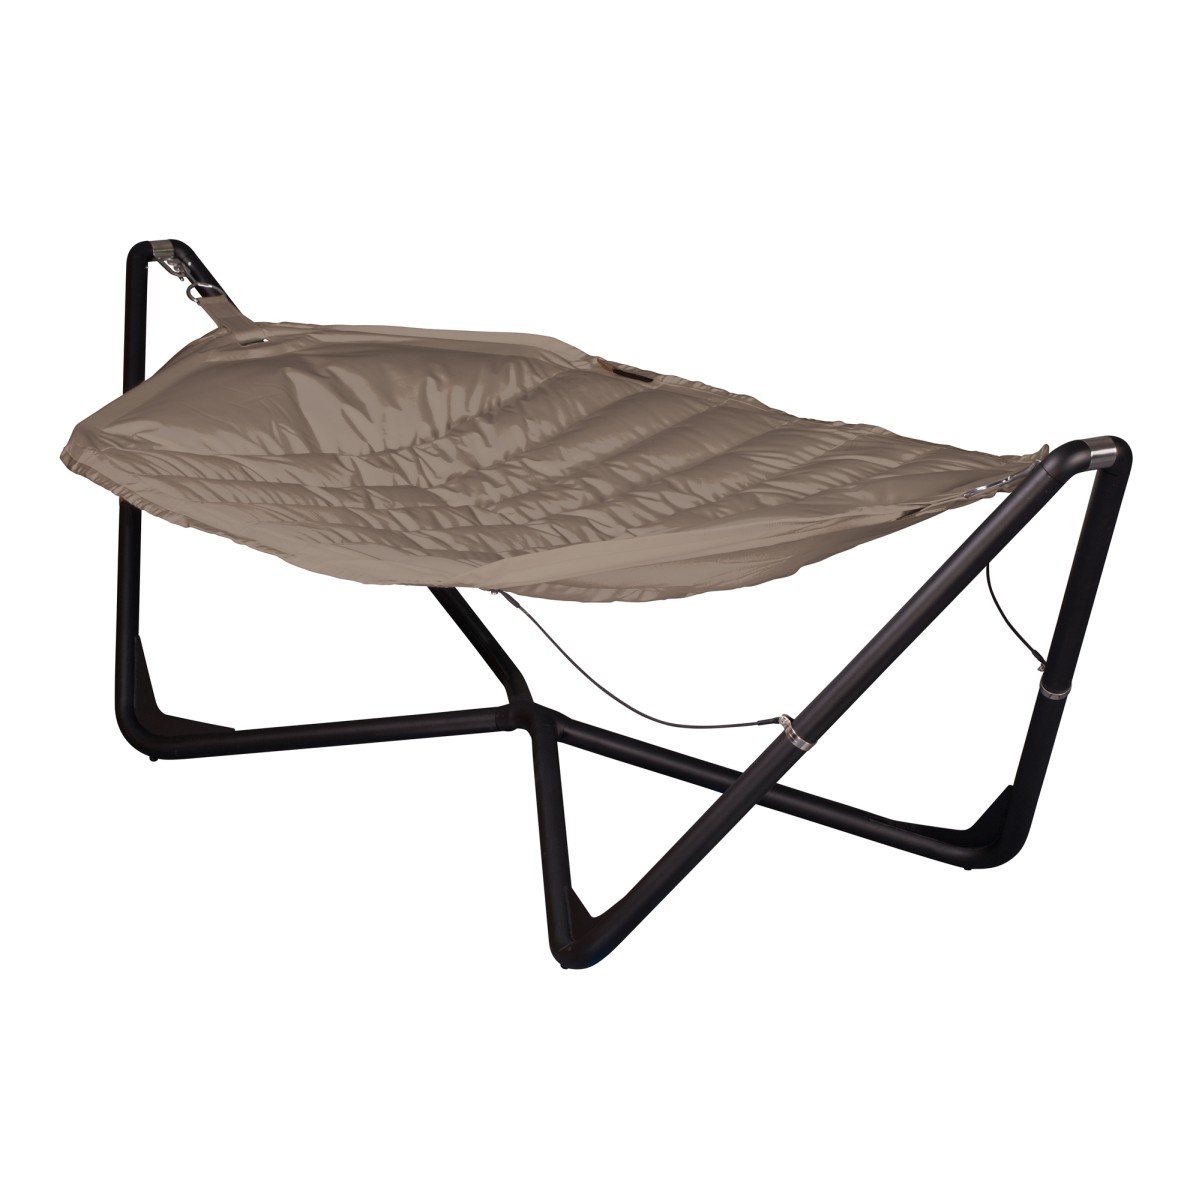 la siesta hamac support lounge xxl serenity taupe. Black Bedroom Furniture Sets. Home Design Ideas